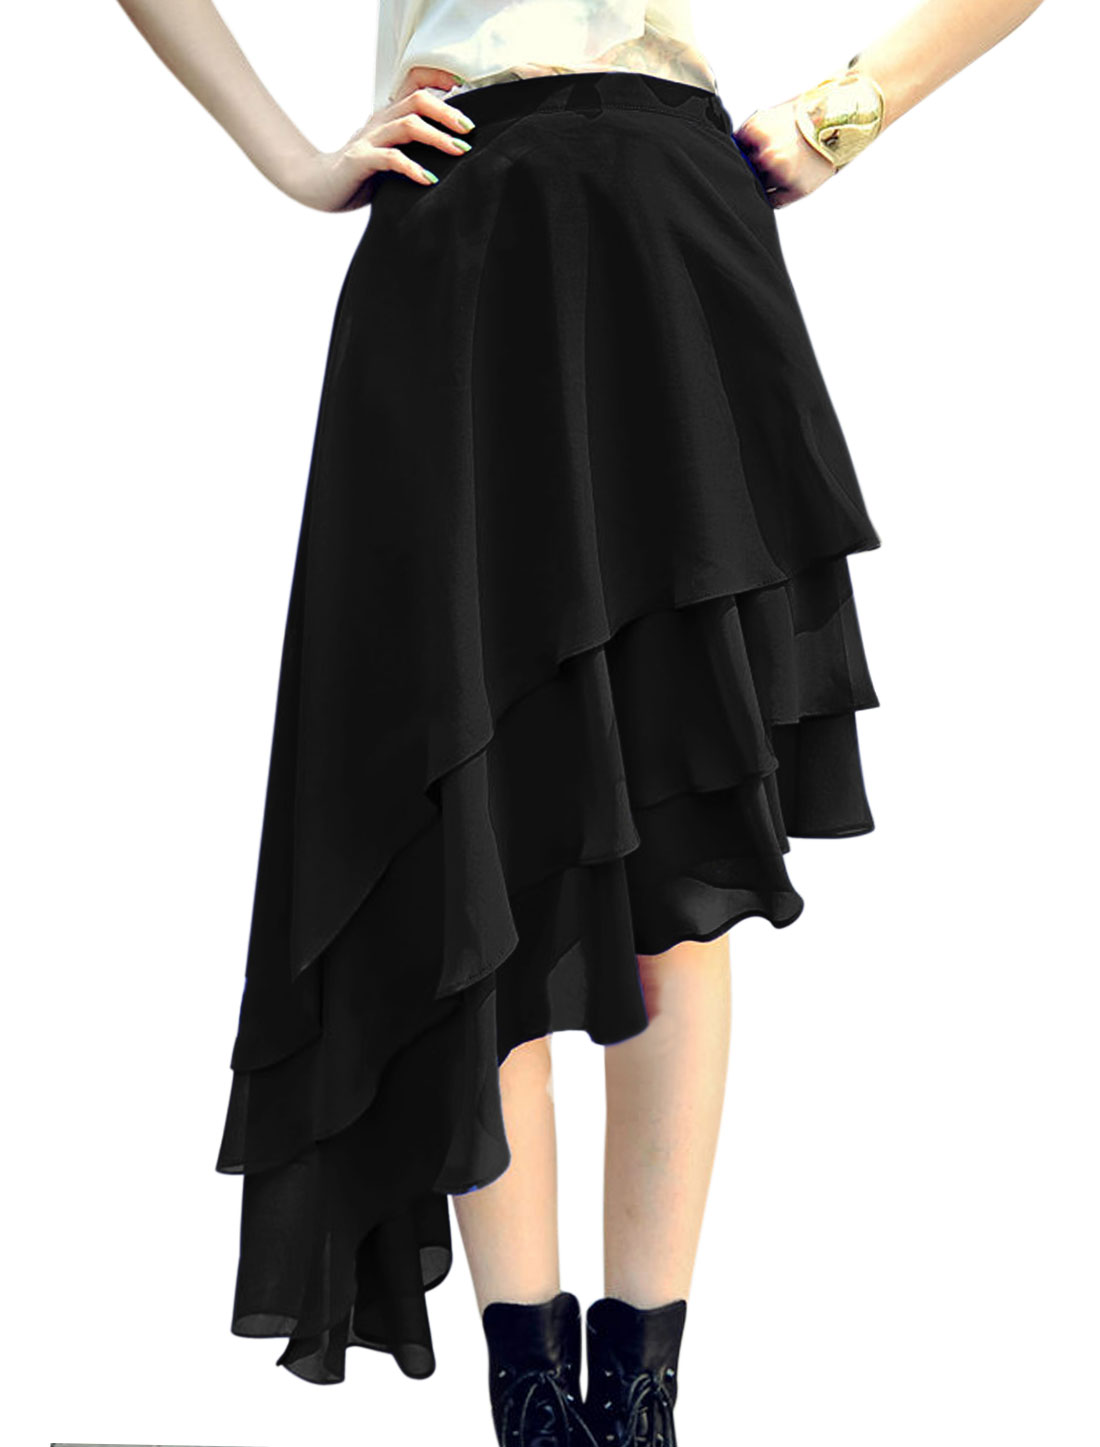 Ladies Elastic Waist Band Asymmetrical Hem Chiffon Tiered Skirt Black S